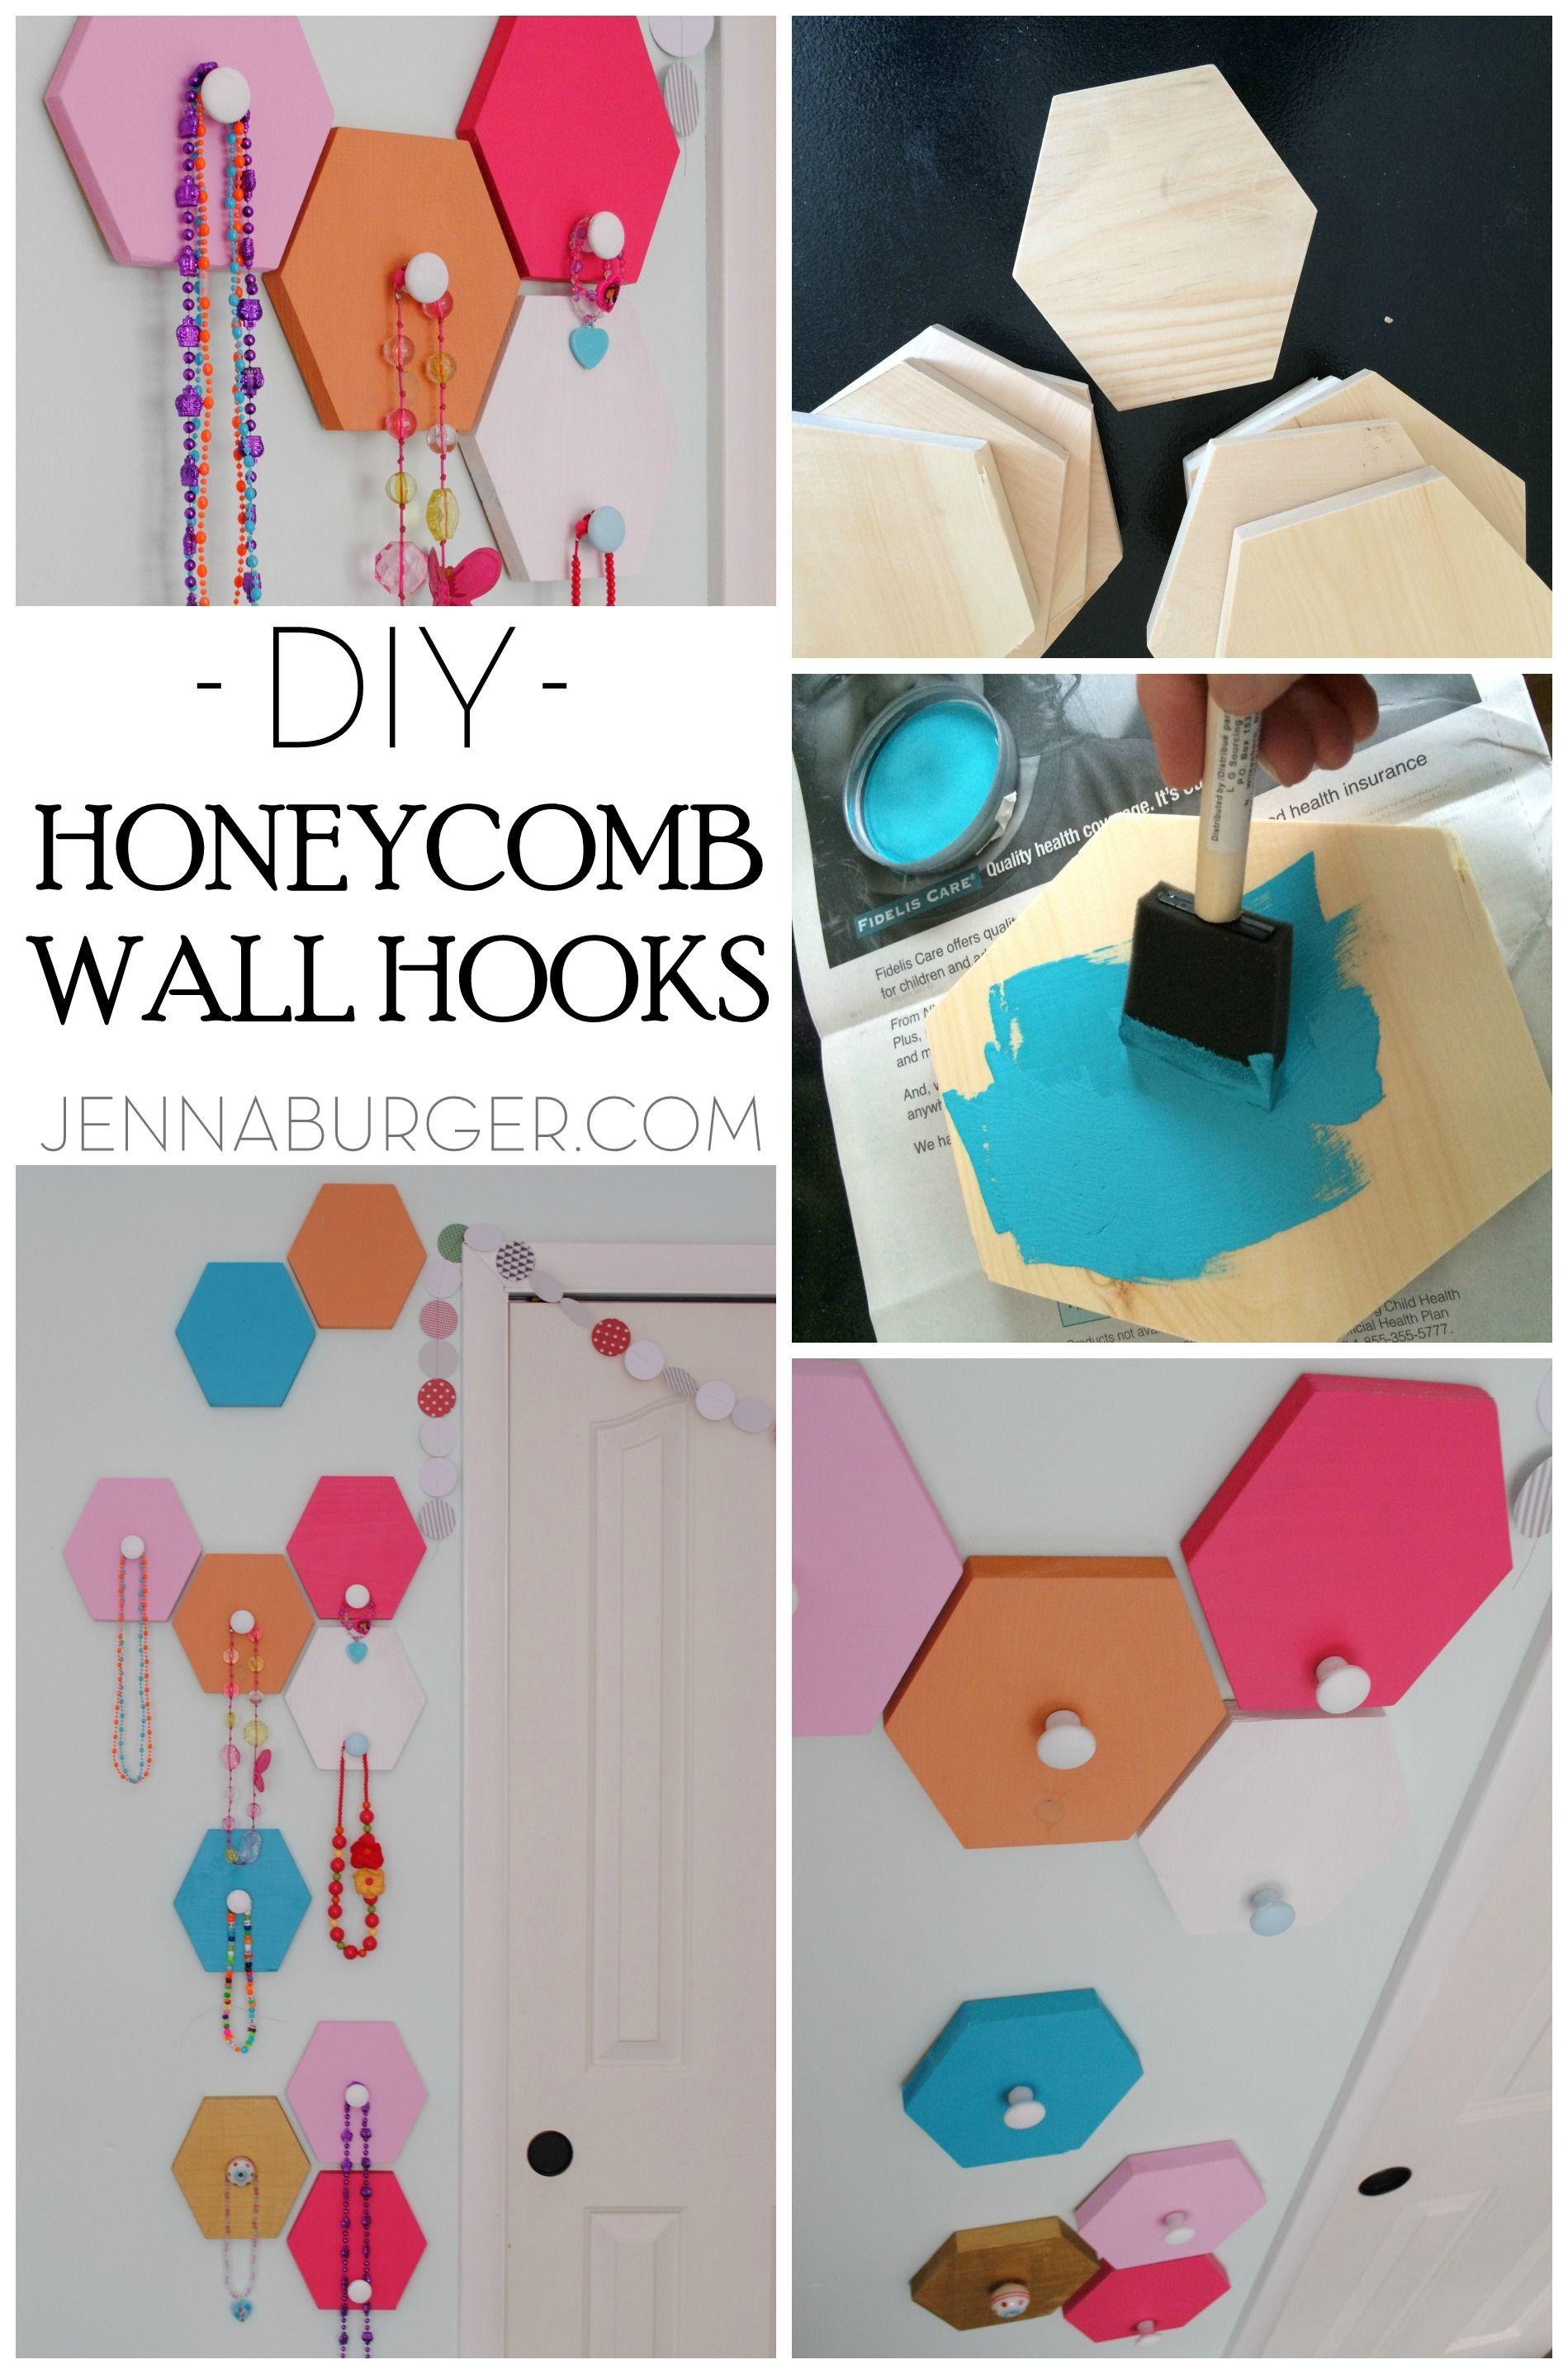 Diy Honeycomb Wall Hooks Diy Honeycomb Diy Craft Projects Honeycomb Shape